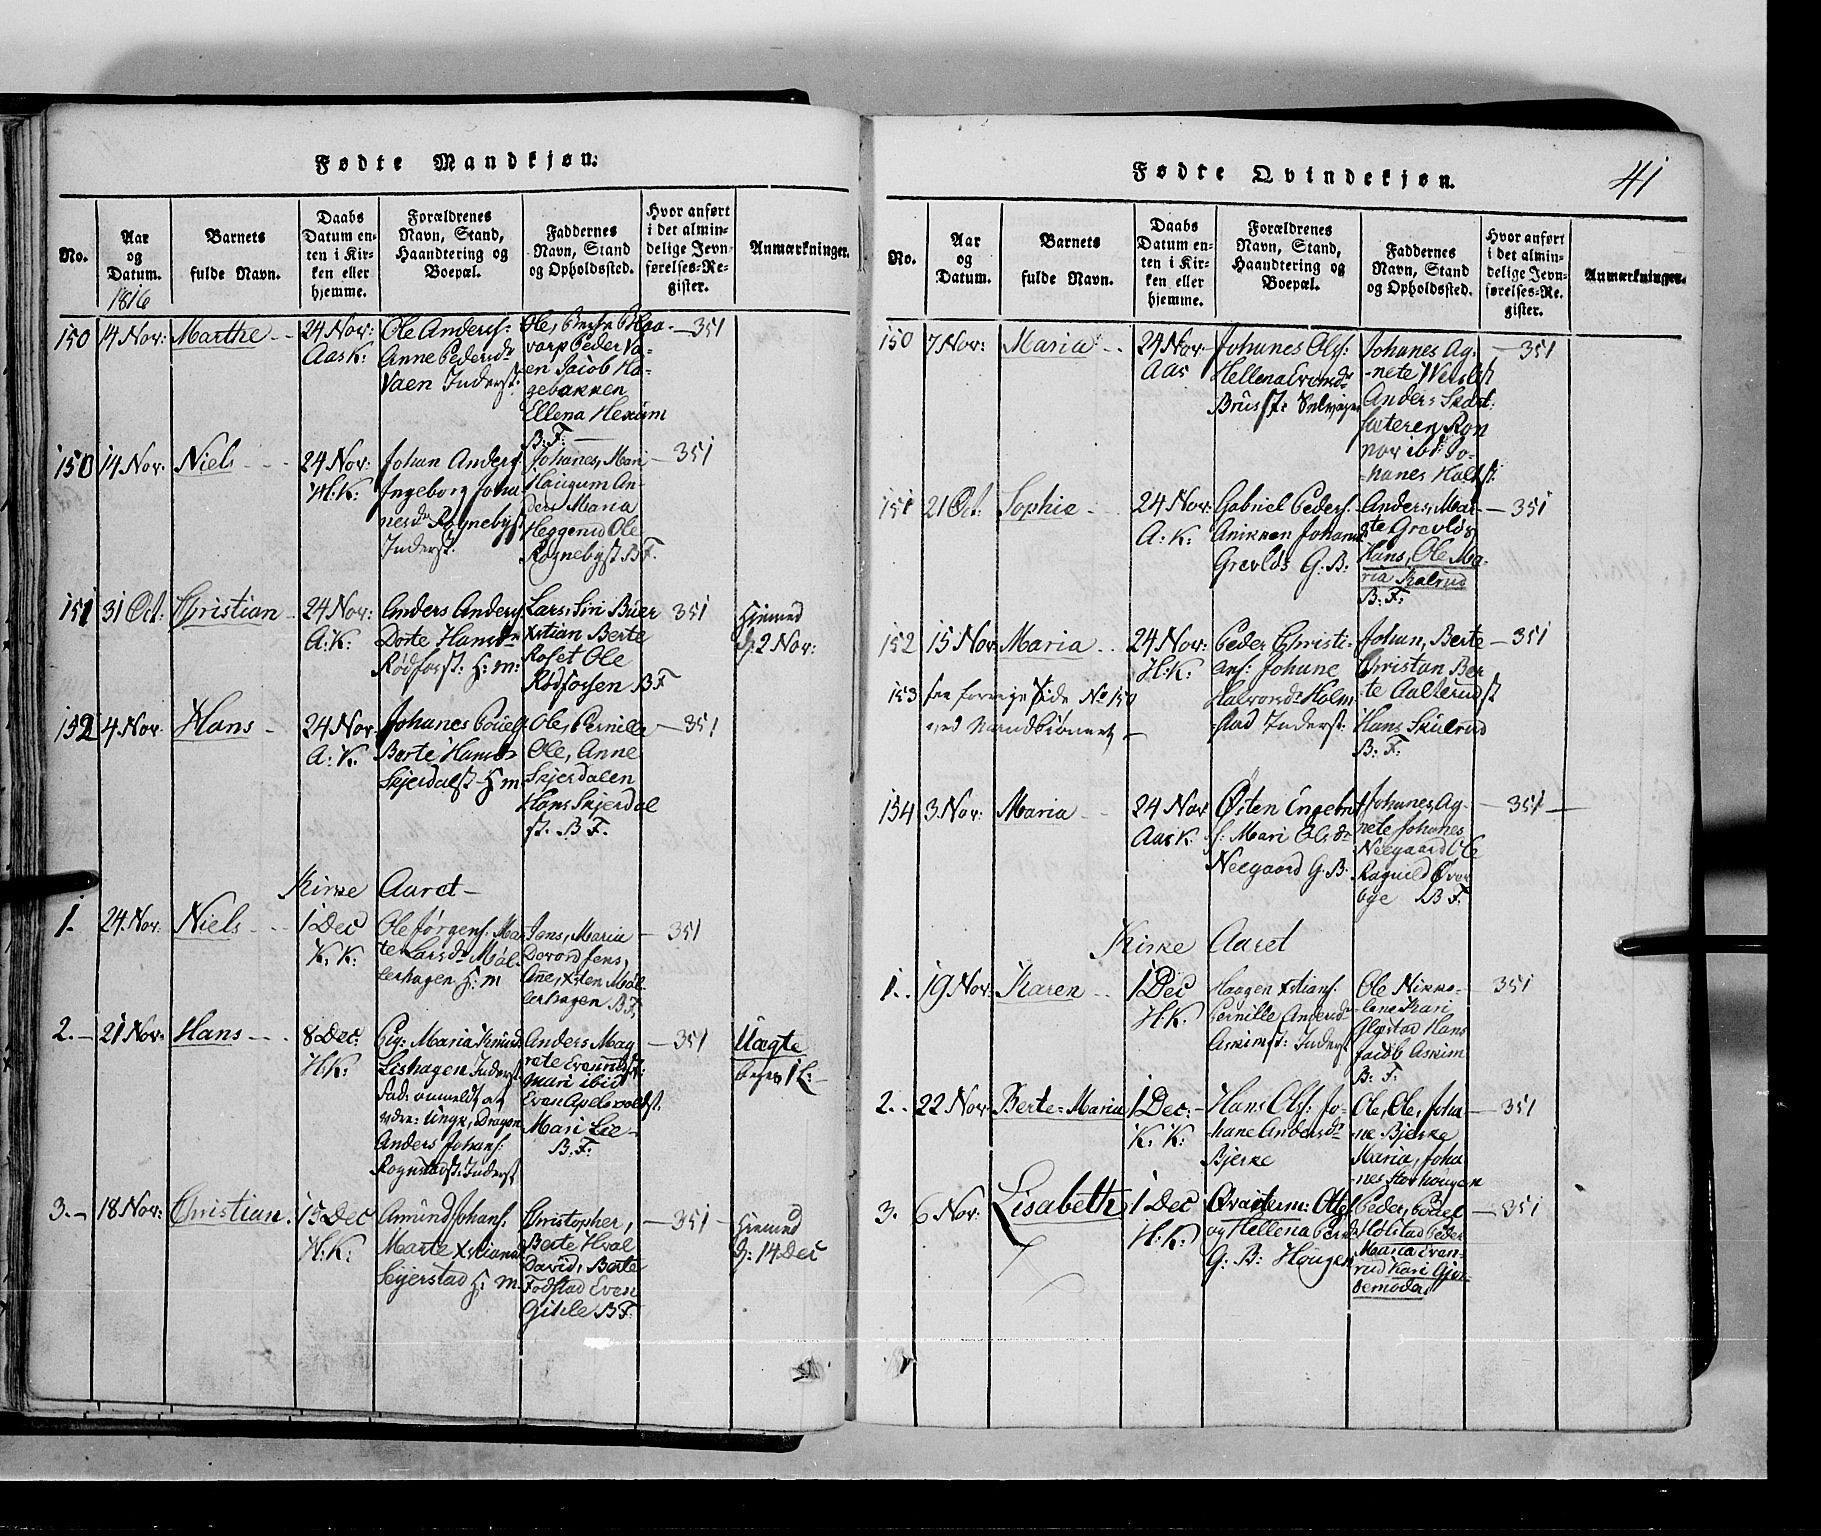 SAH, Toten prestekontor, Klokkerbok nr. 1, 1814-1820, s. 41